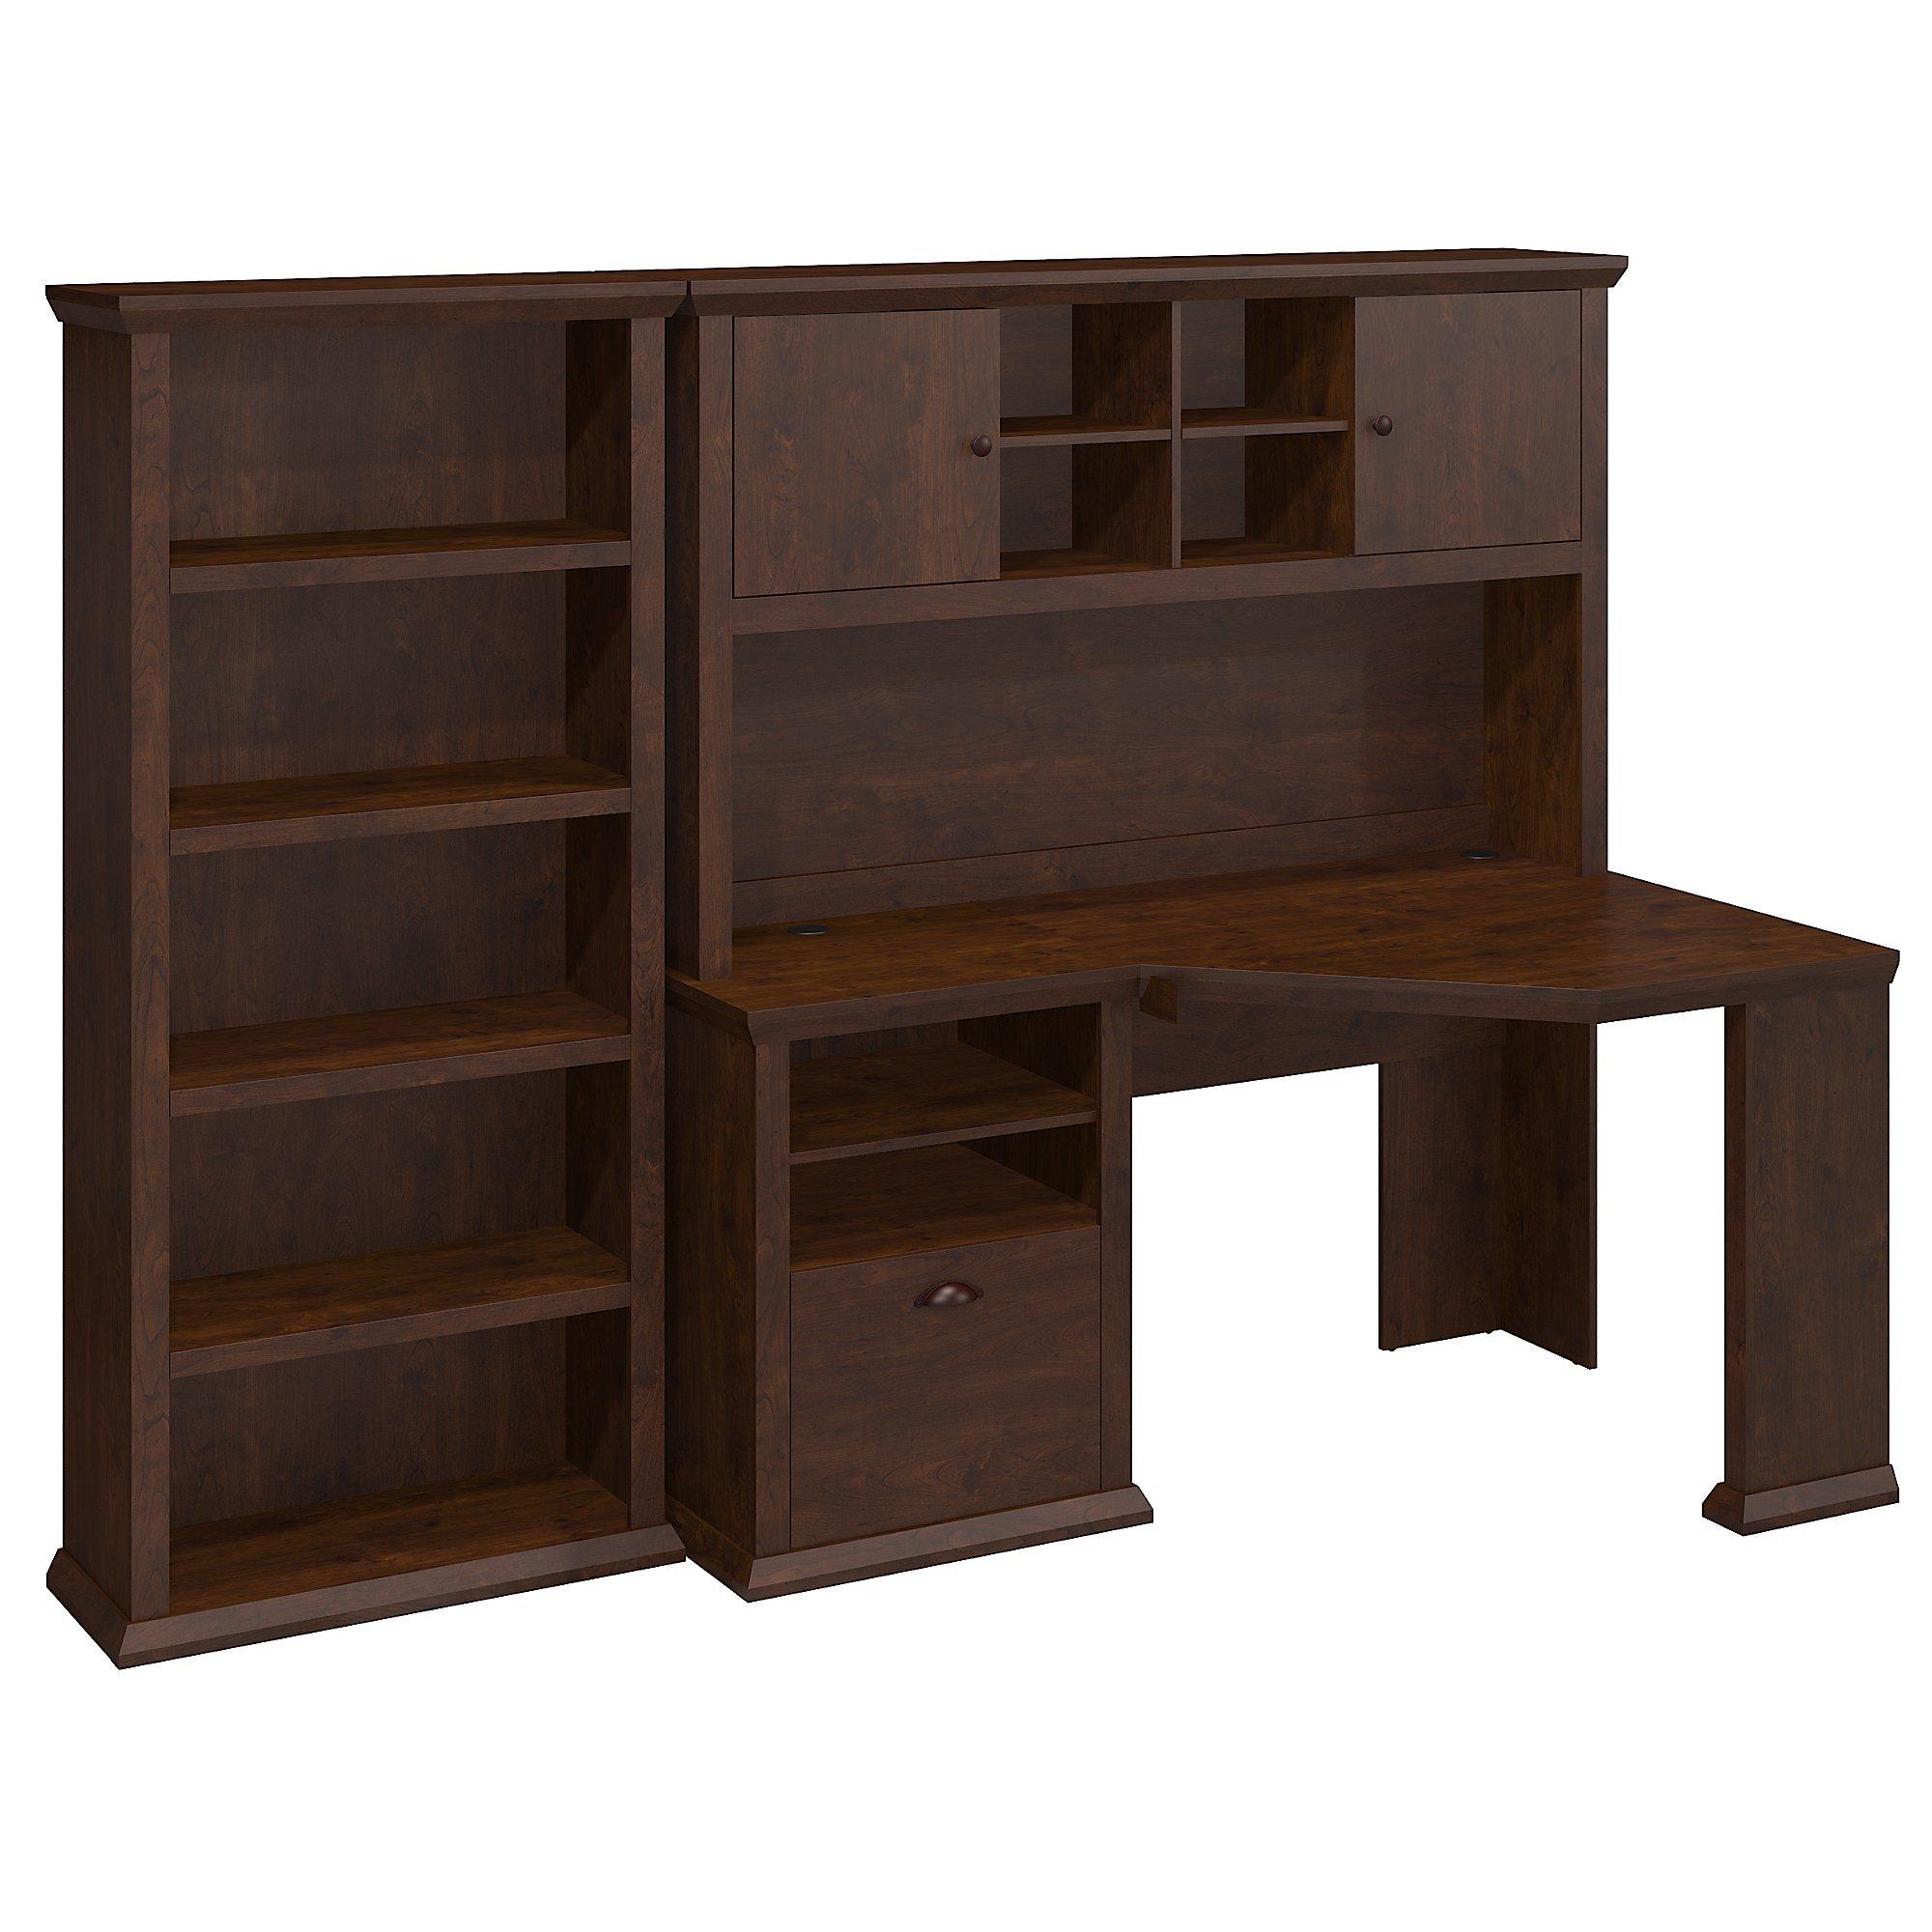 Yorktown Corner Desk with Hutch and Bookcase